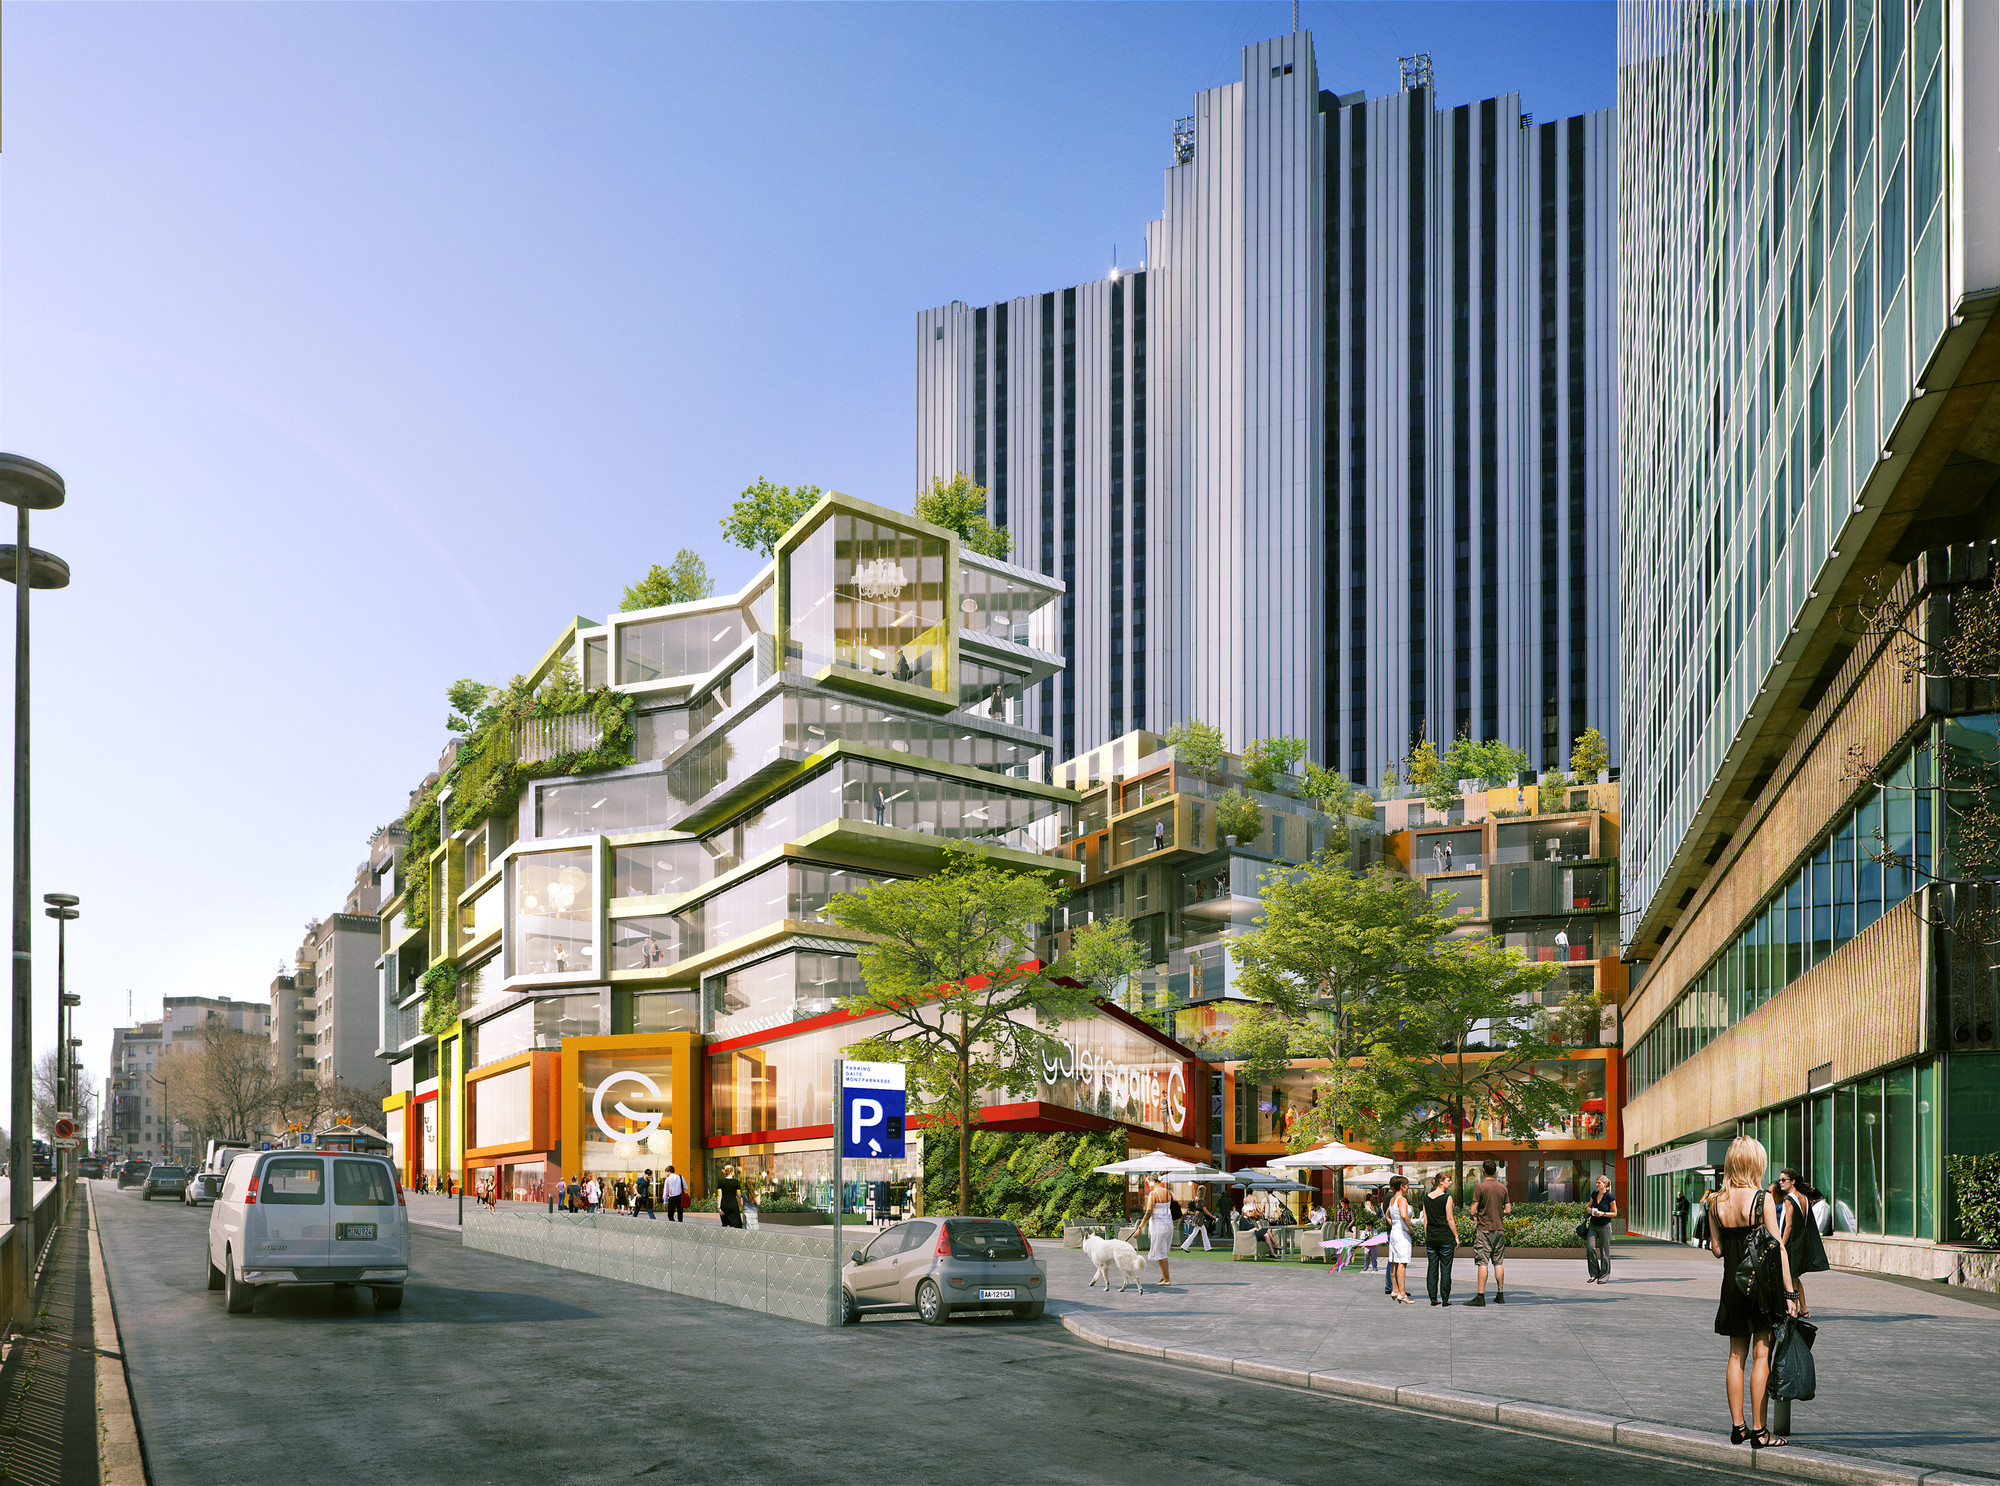 gallery of city of paris approves mvrdv 39 s restructuring of montparnasse superblock 2. Black Bedroom Furniture Sets. Home Design Ideas